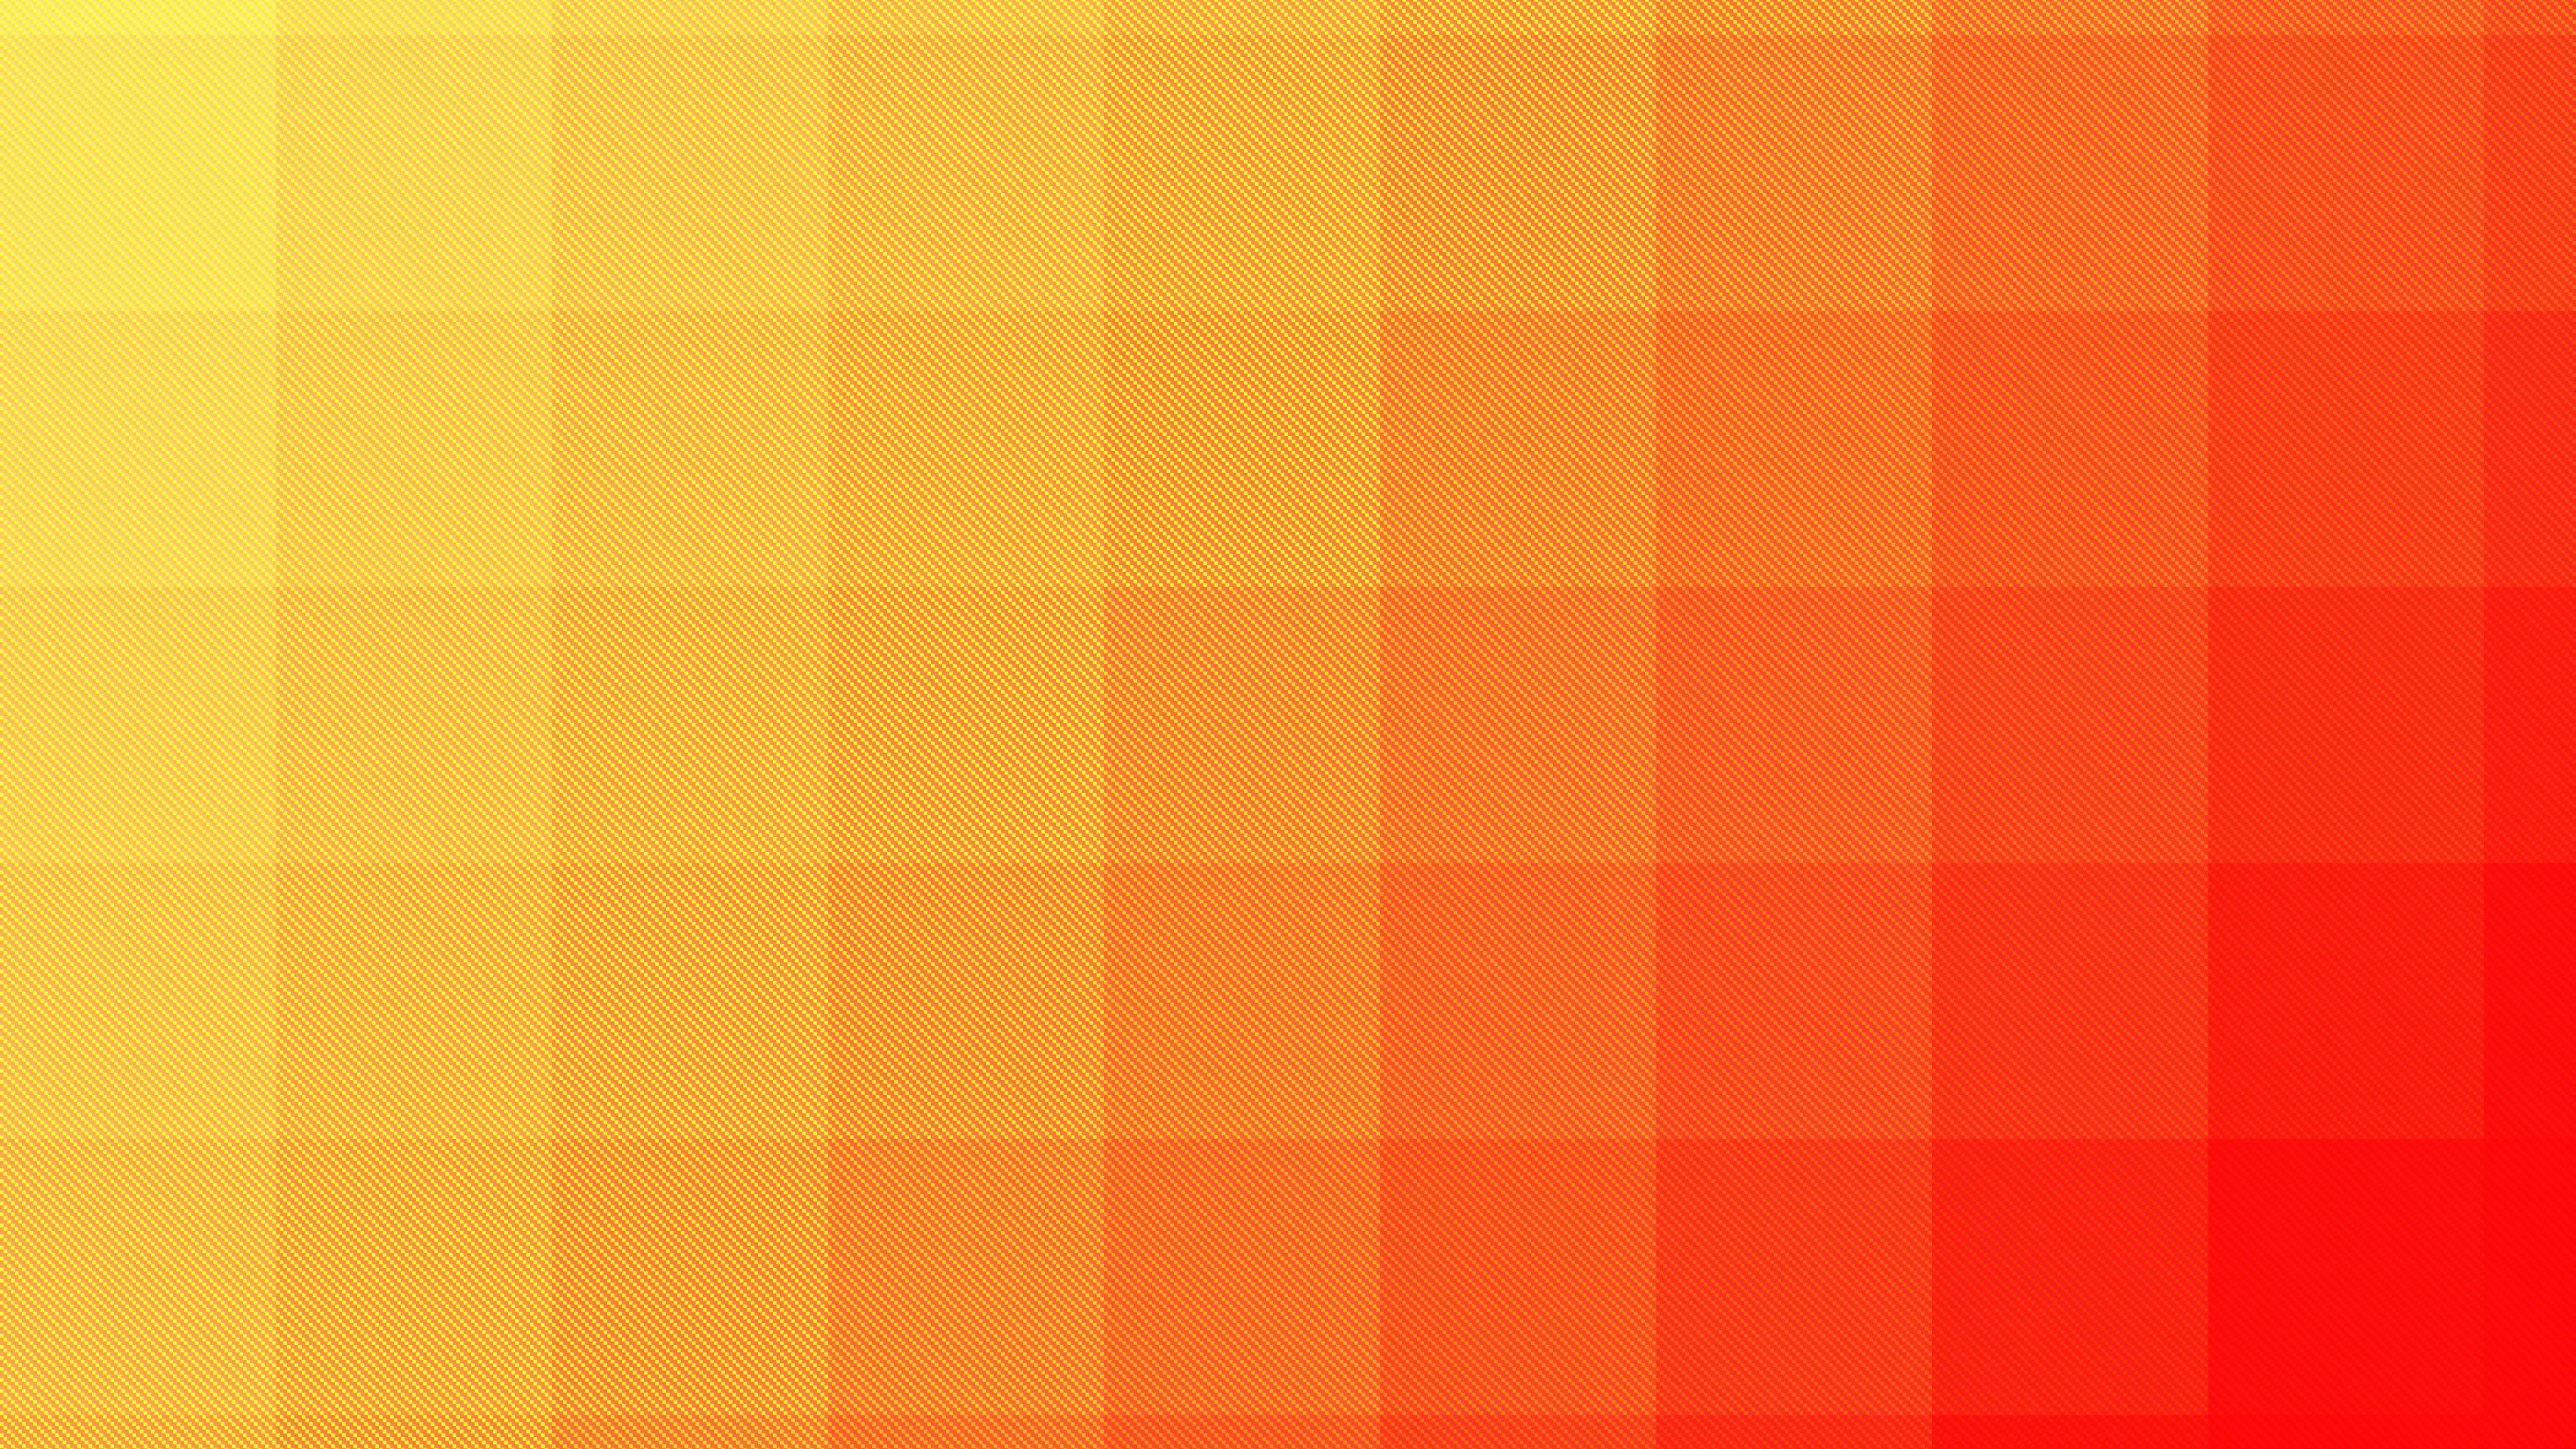 color dark orange